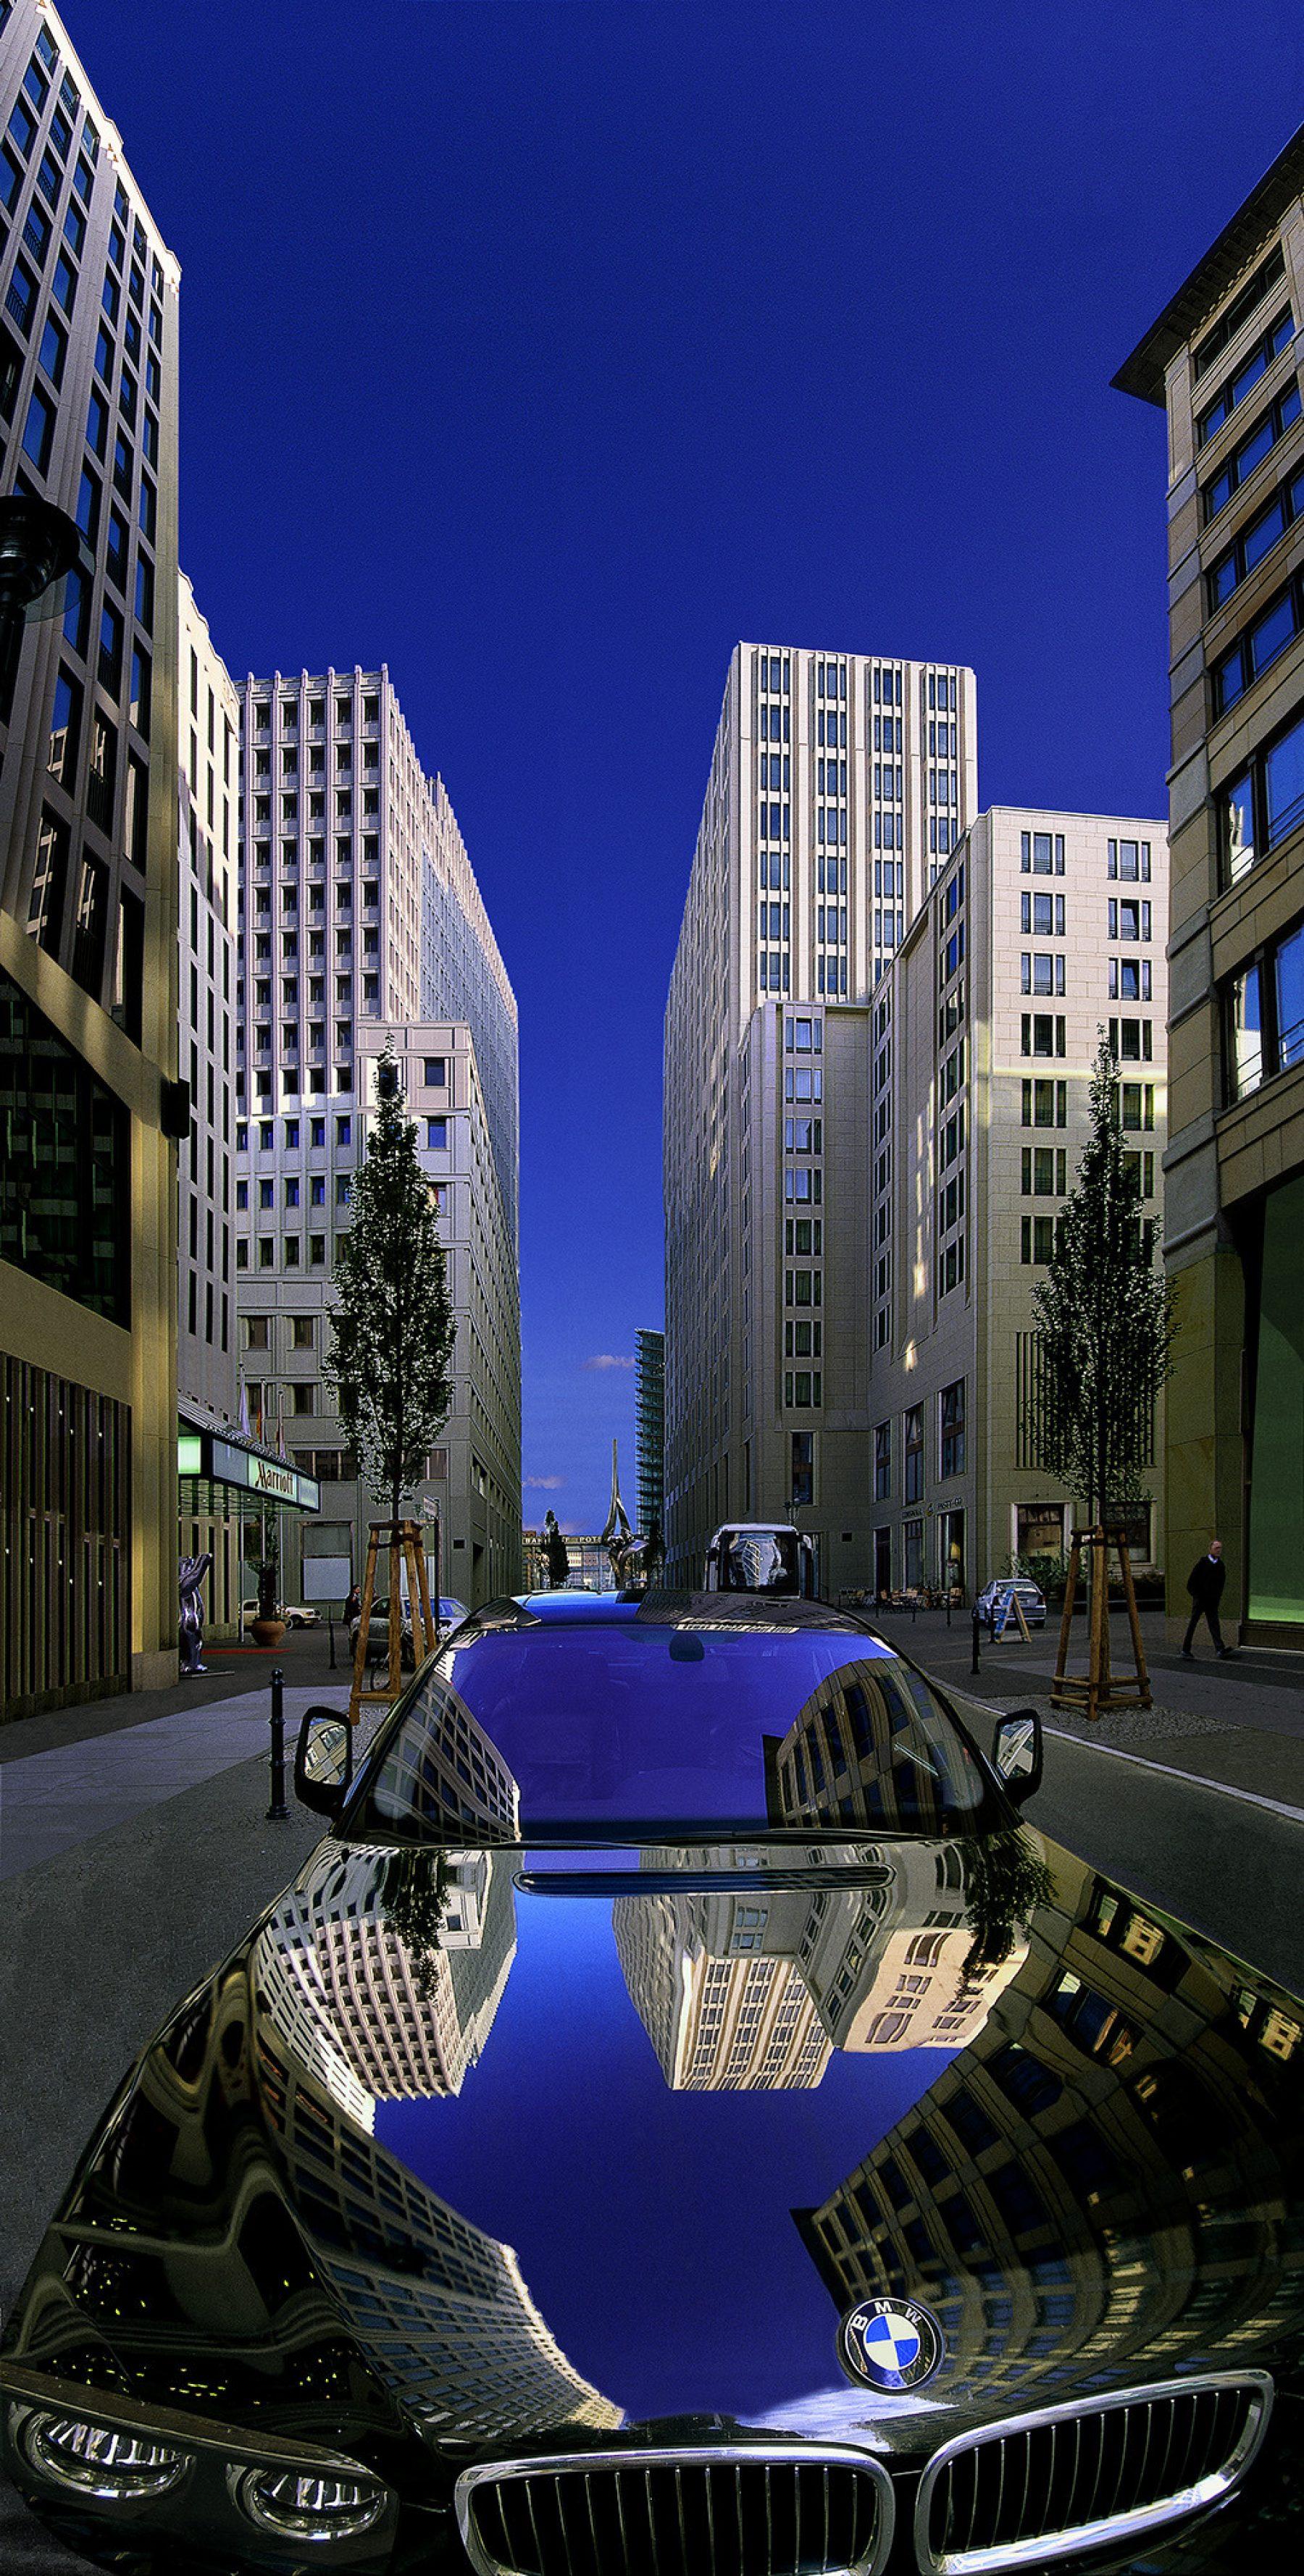 Berlin, Potsdamer Platz, BMW